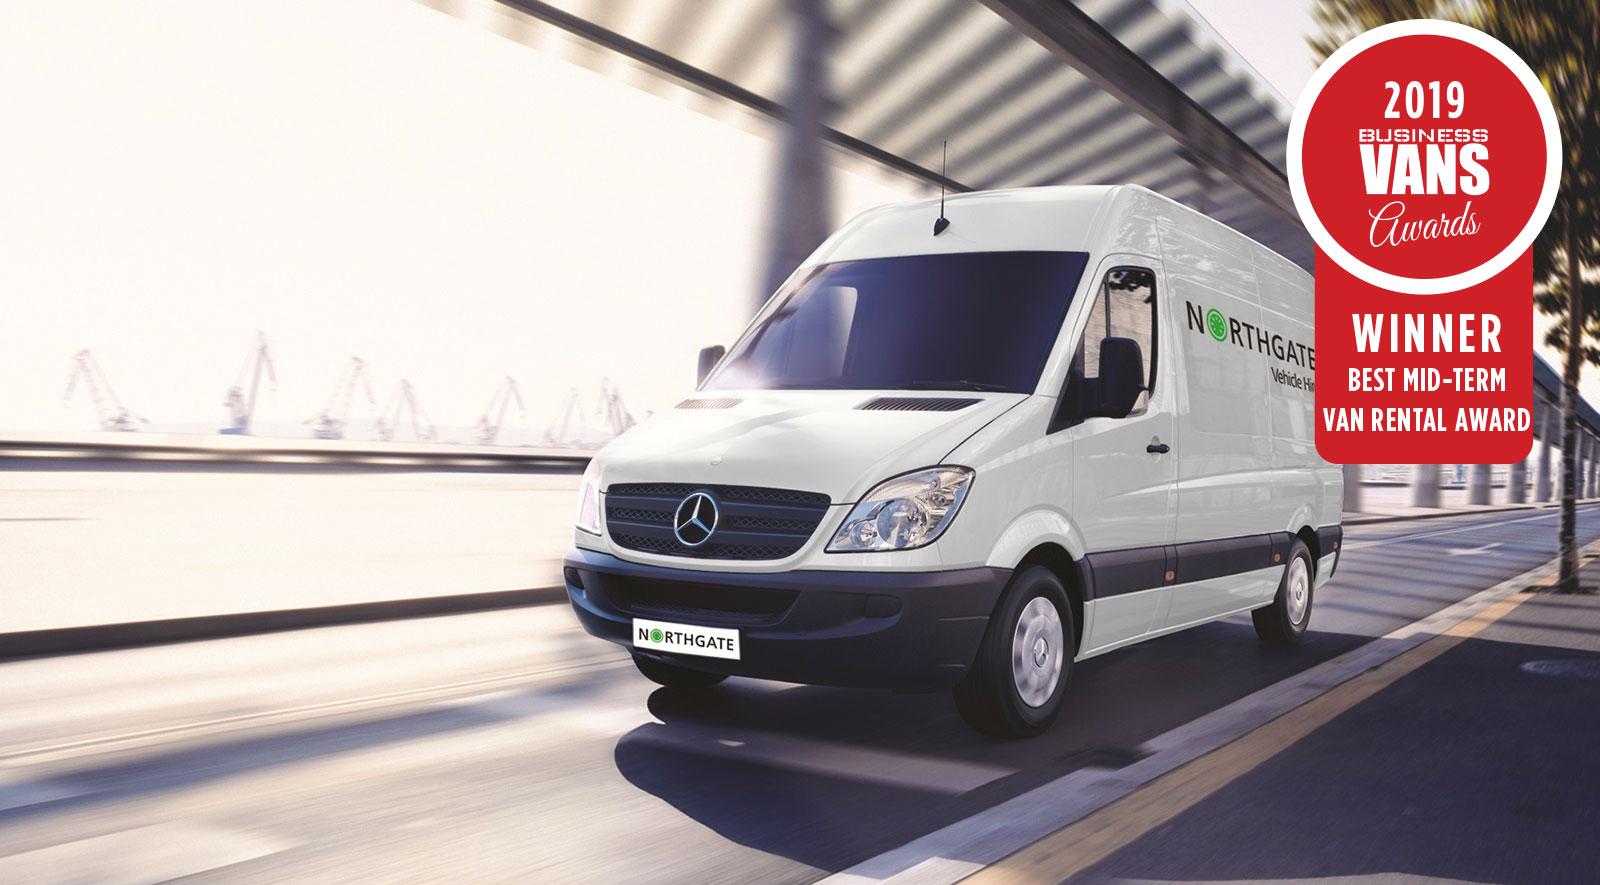 44b034ce87 Best Mid-Term Van Rental Award – Northgate plc - Business Vans